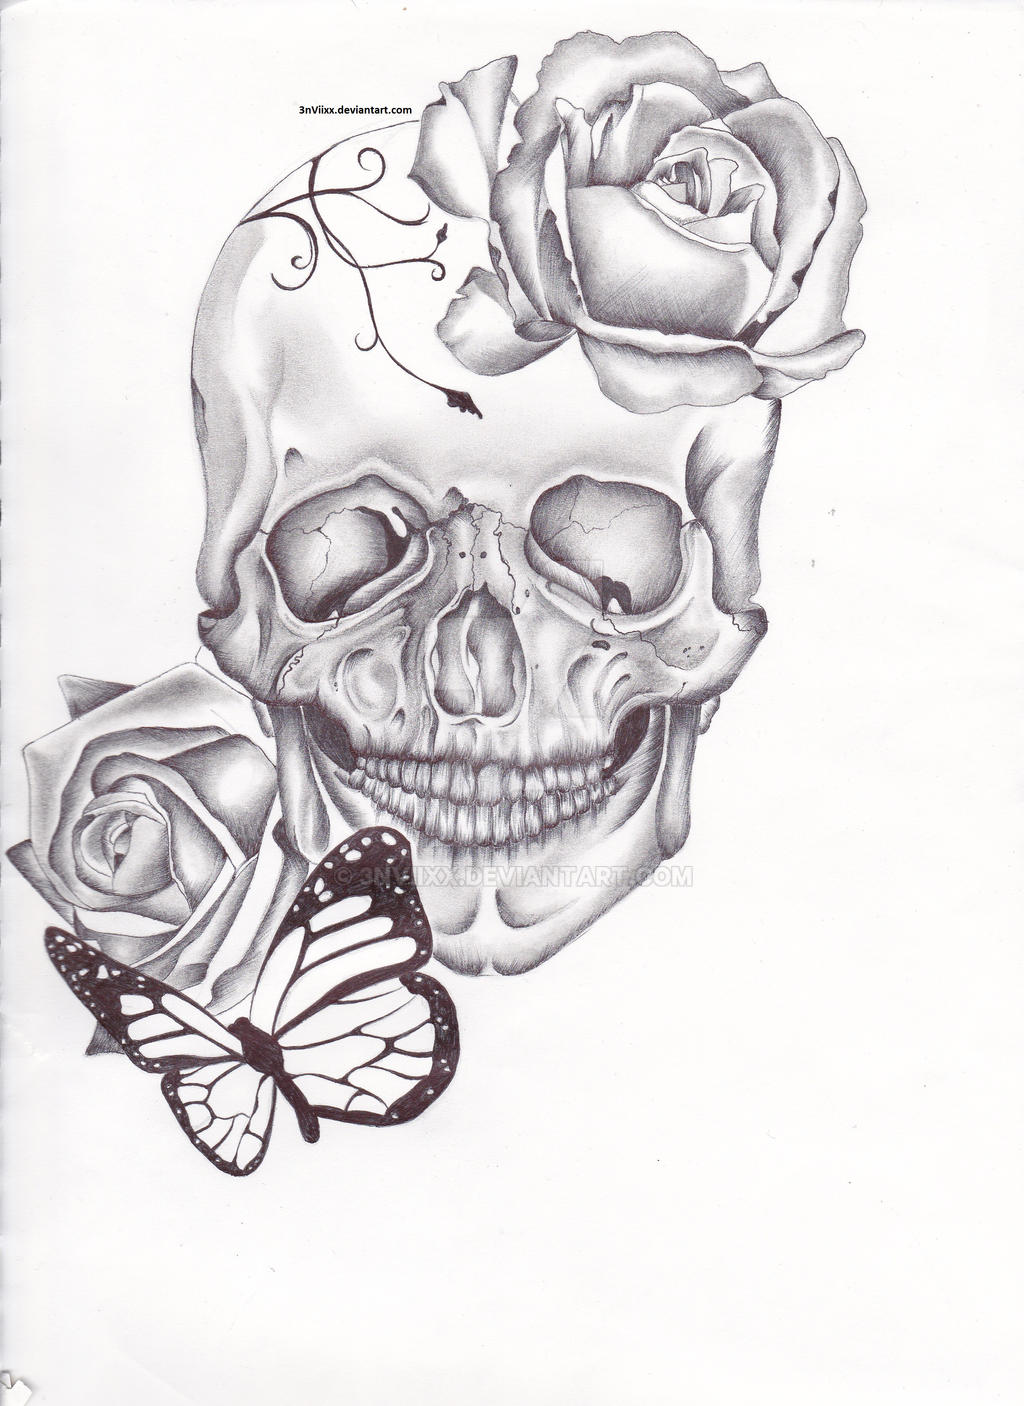 skull tattoo design by 3nviixx on deviantart. Black Bedroom Furniture Sets. Home Design Ideas